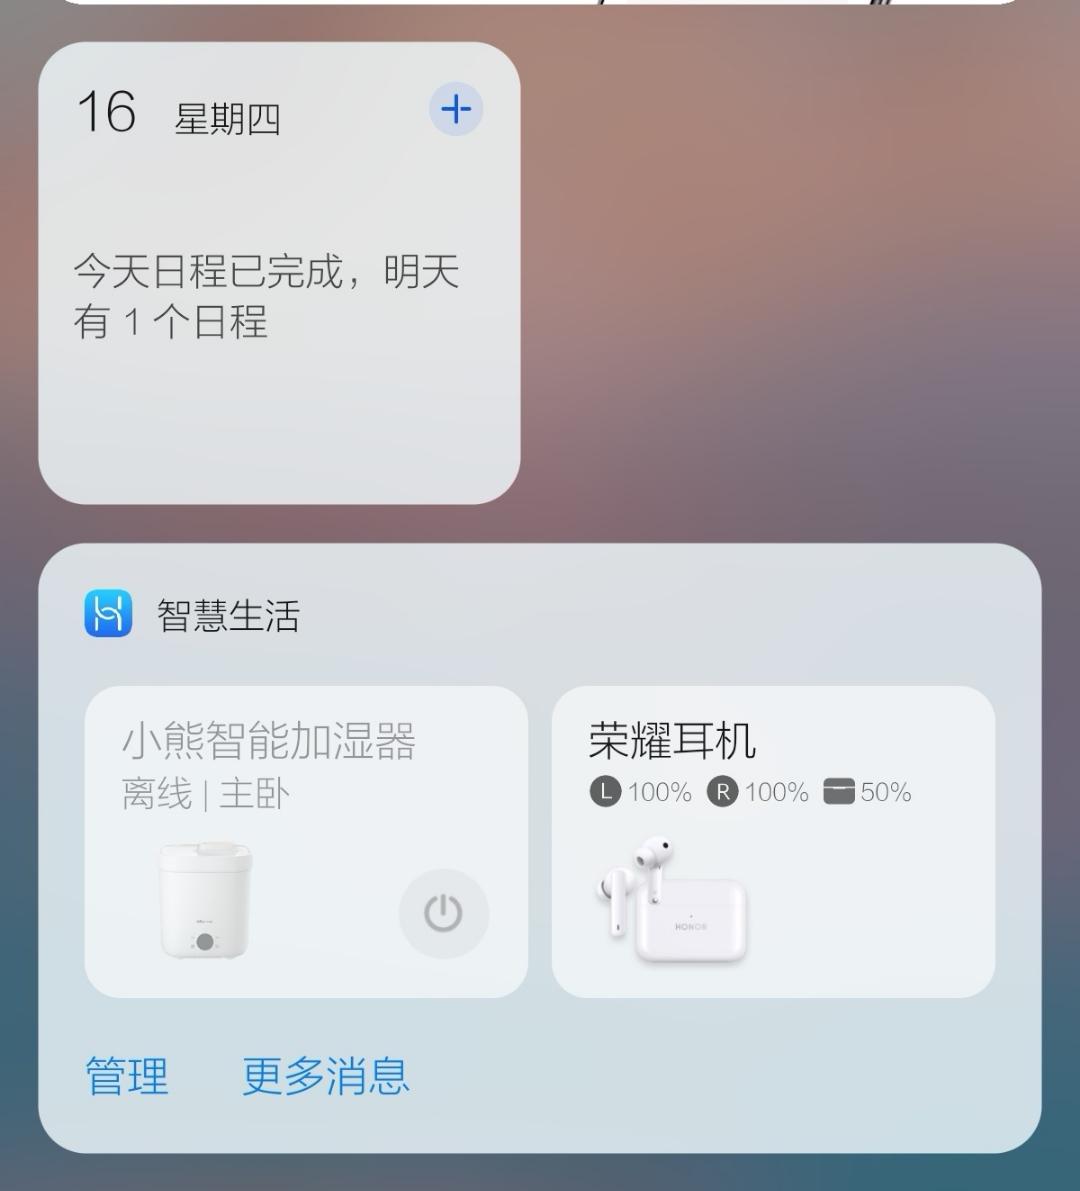 Screenshot_20210916_105052_com.huawei.android.launcher_edit_432753442106361.jpg